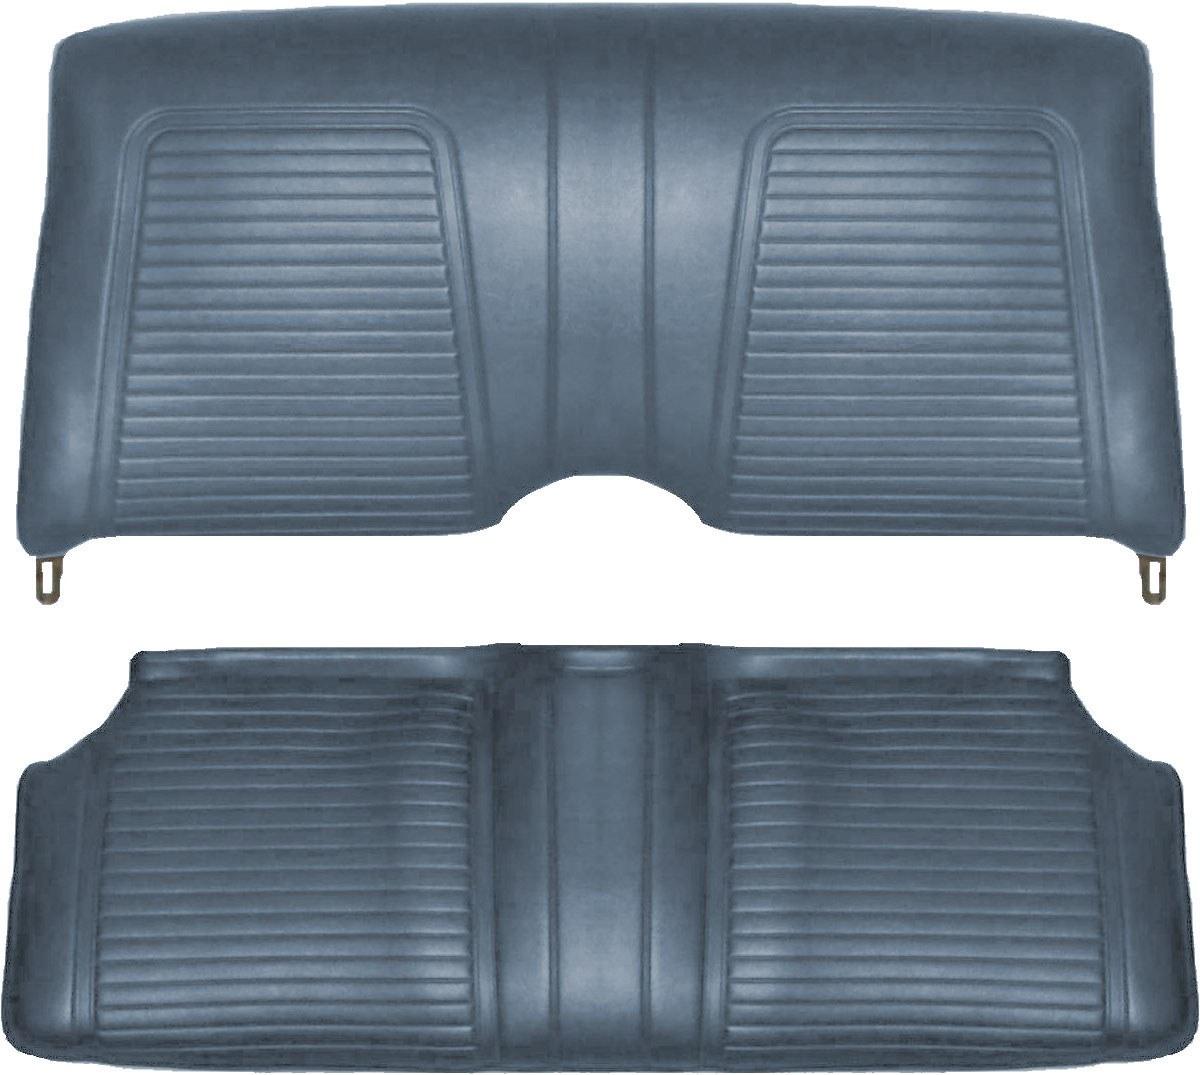 1969 Camaro Standard Interior Bucket Seat Covers  Dark Blue